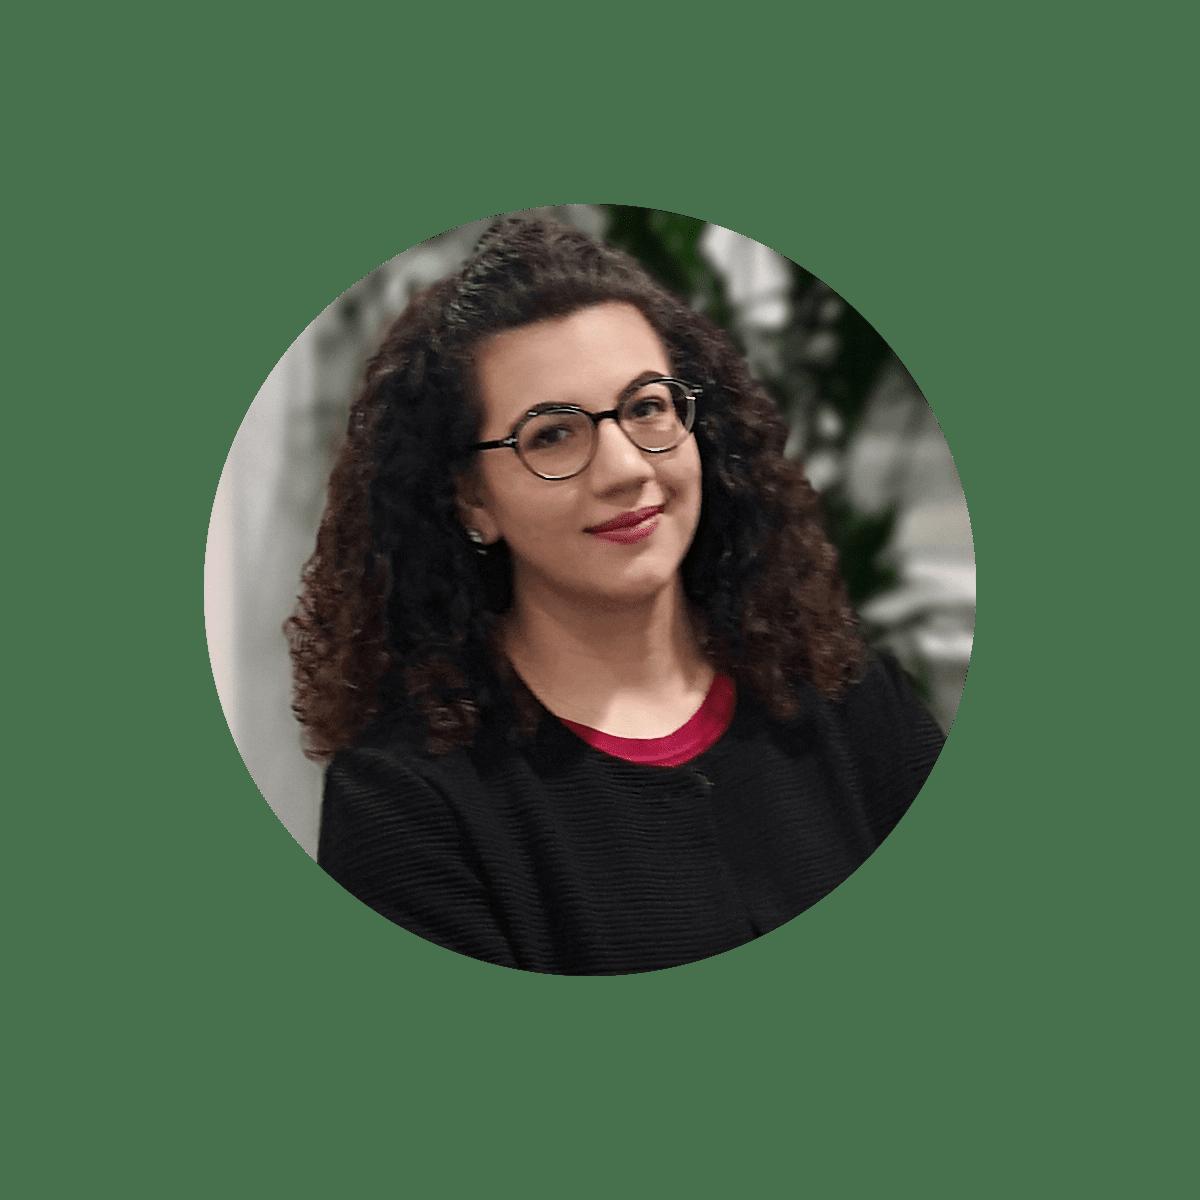 Alessia Fravolini